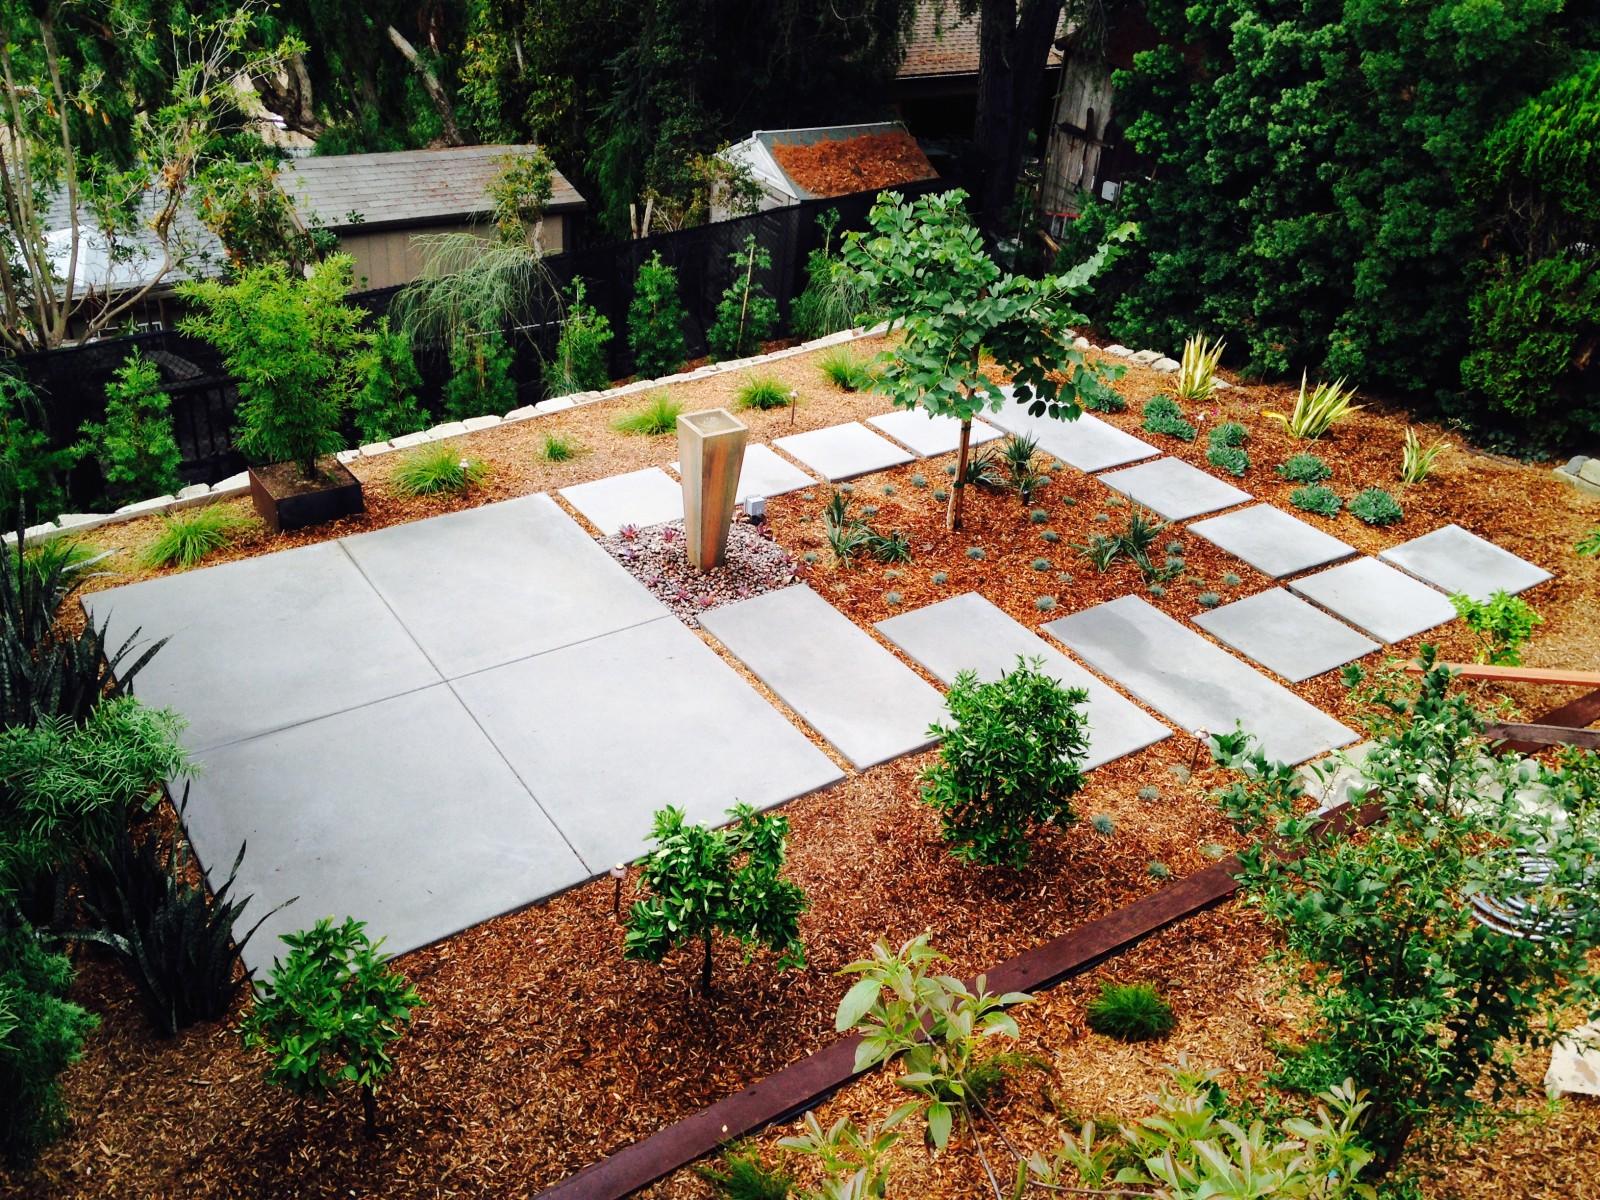 Terrain landscape design gallery for Terrain landscape architecture